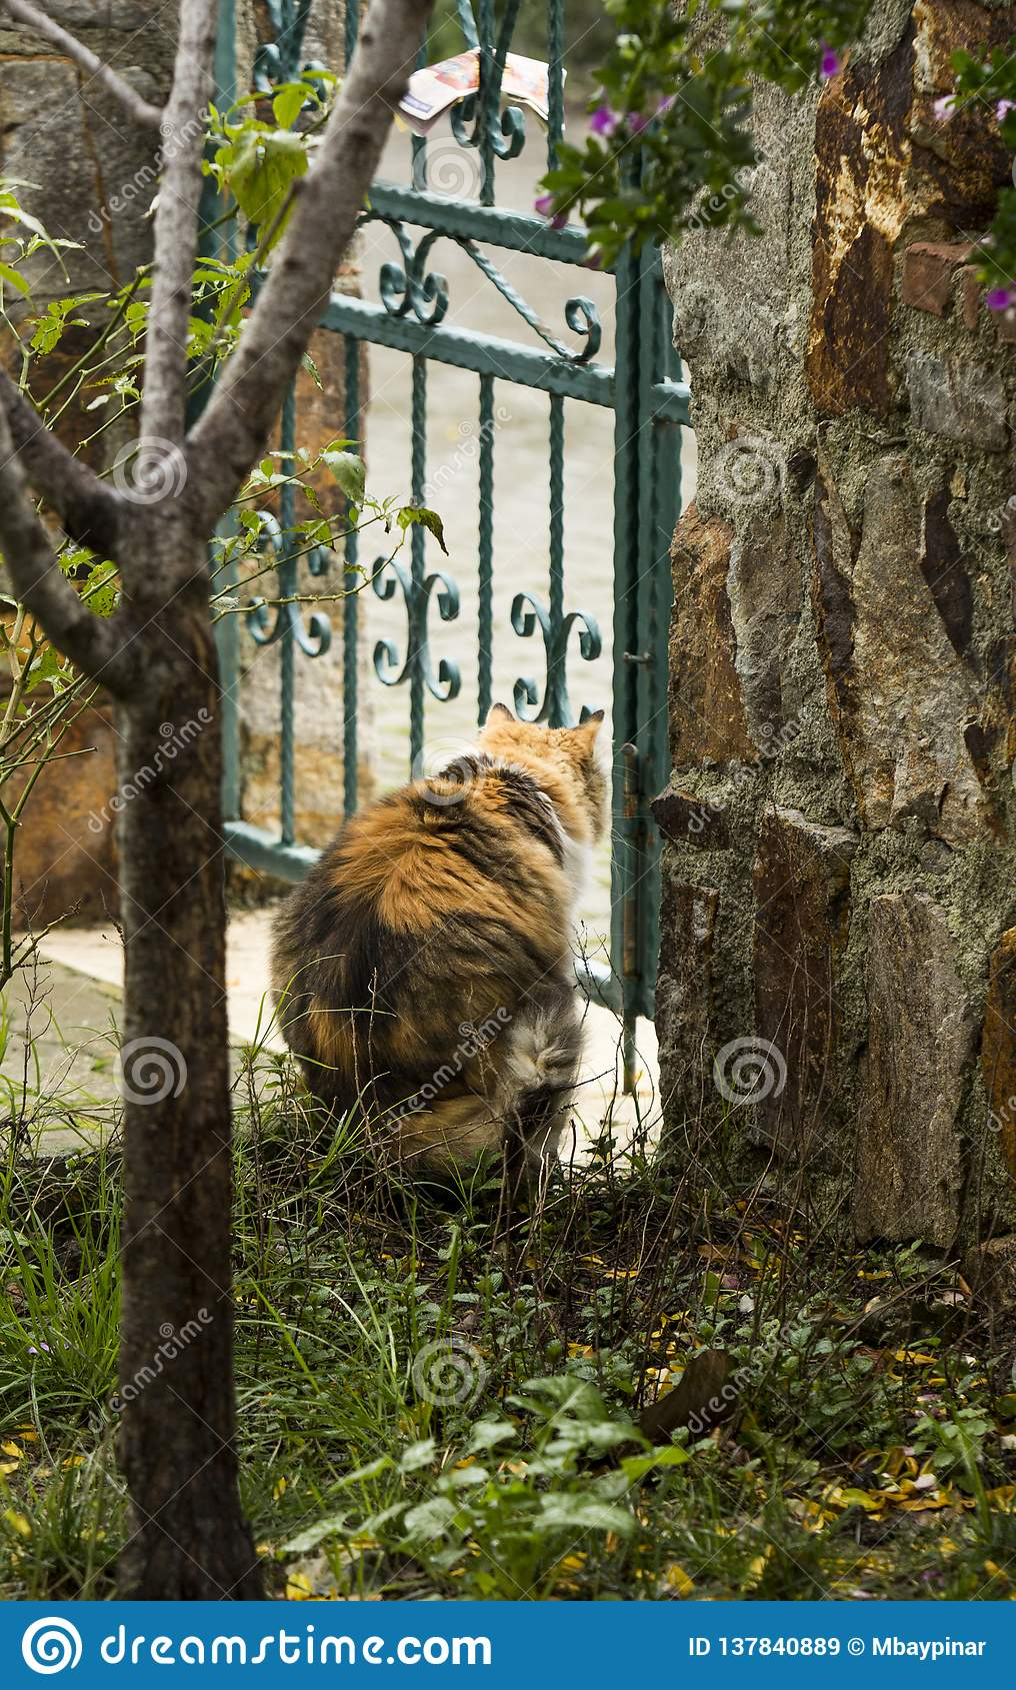 A tricolor cat seen from back stares through an iron cast garden door.